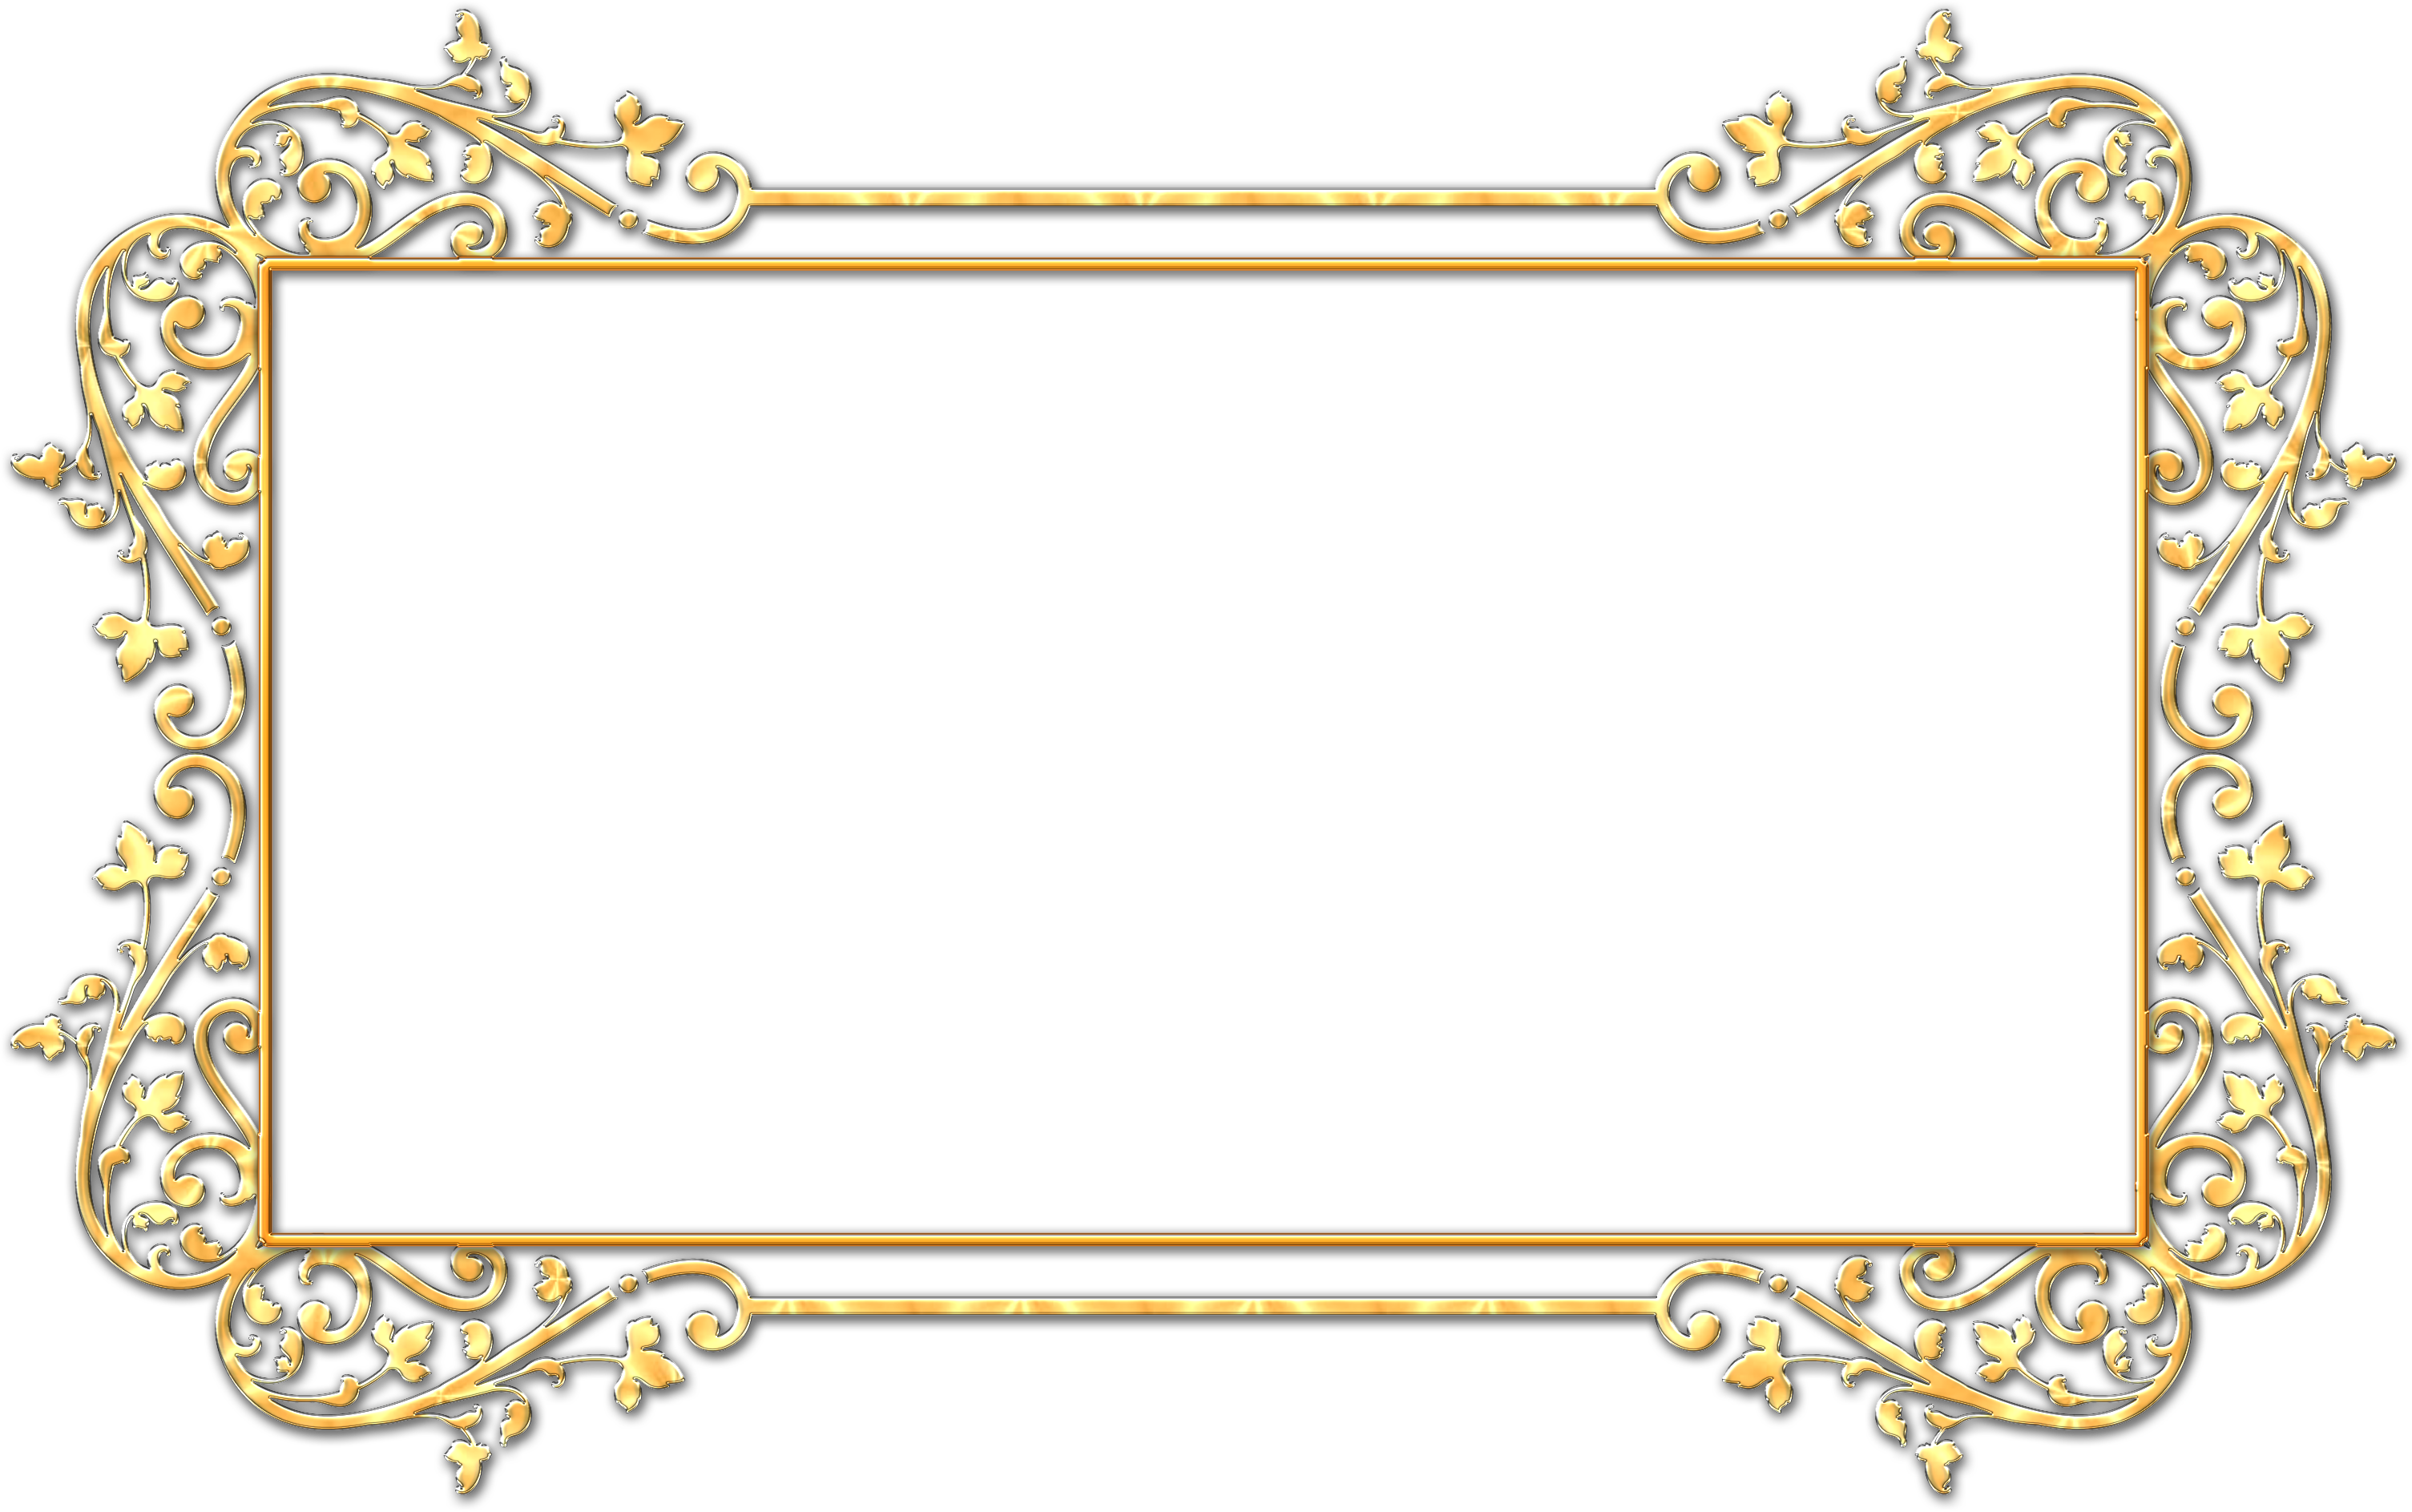 Oval Brown Floral Frame Frames Mirror Gold Mirror Transparent Background Png Clipart Gold Picture Frames Mirror Illustration Mirror Frames